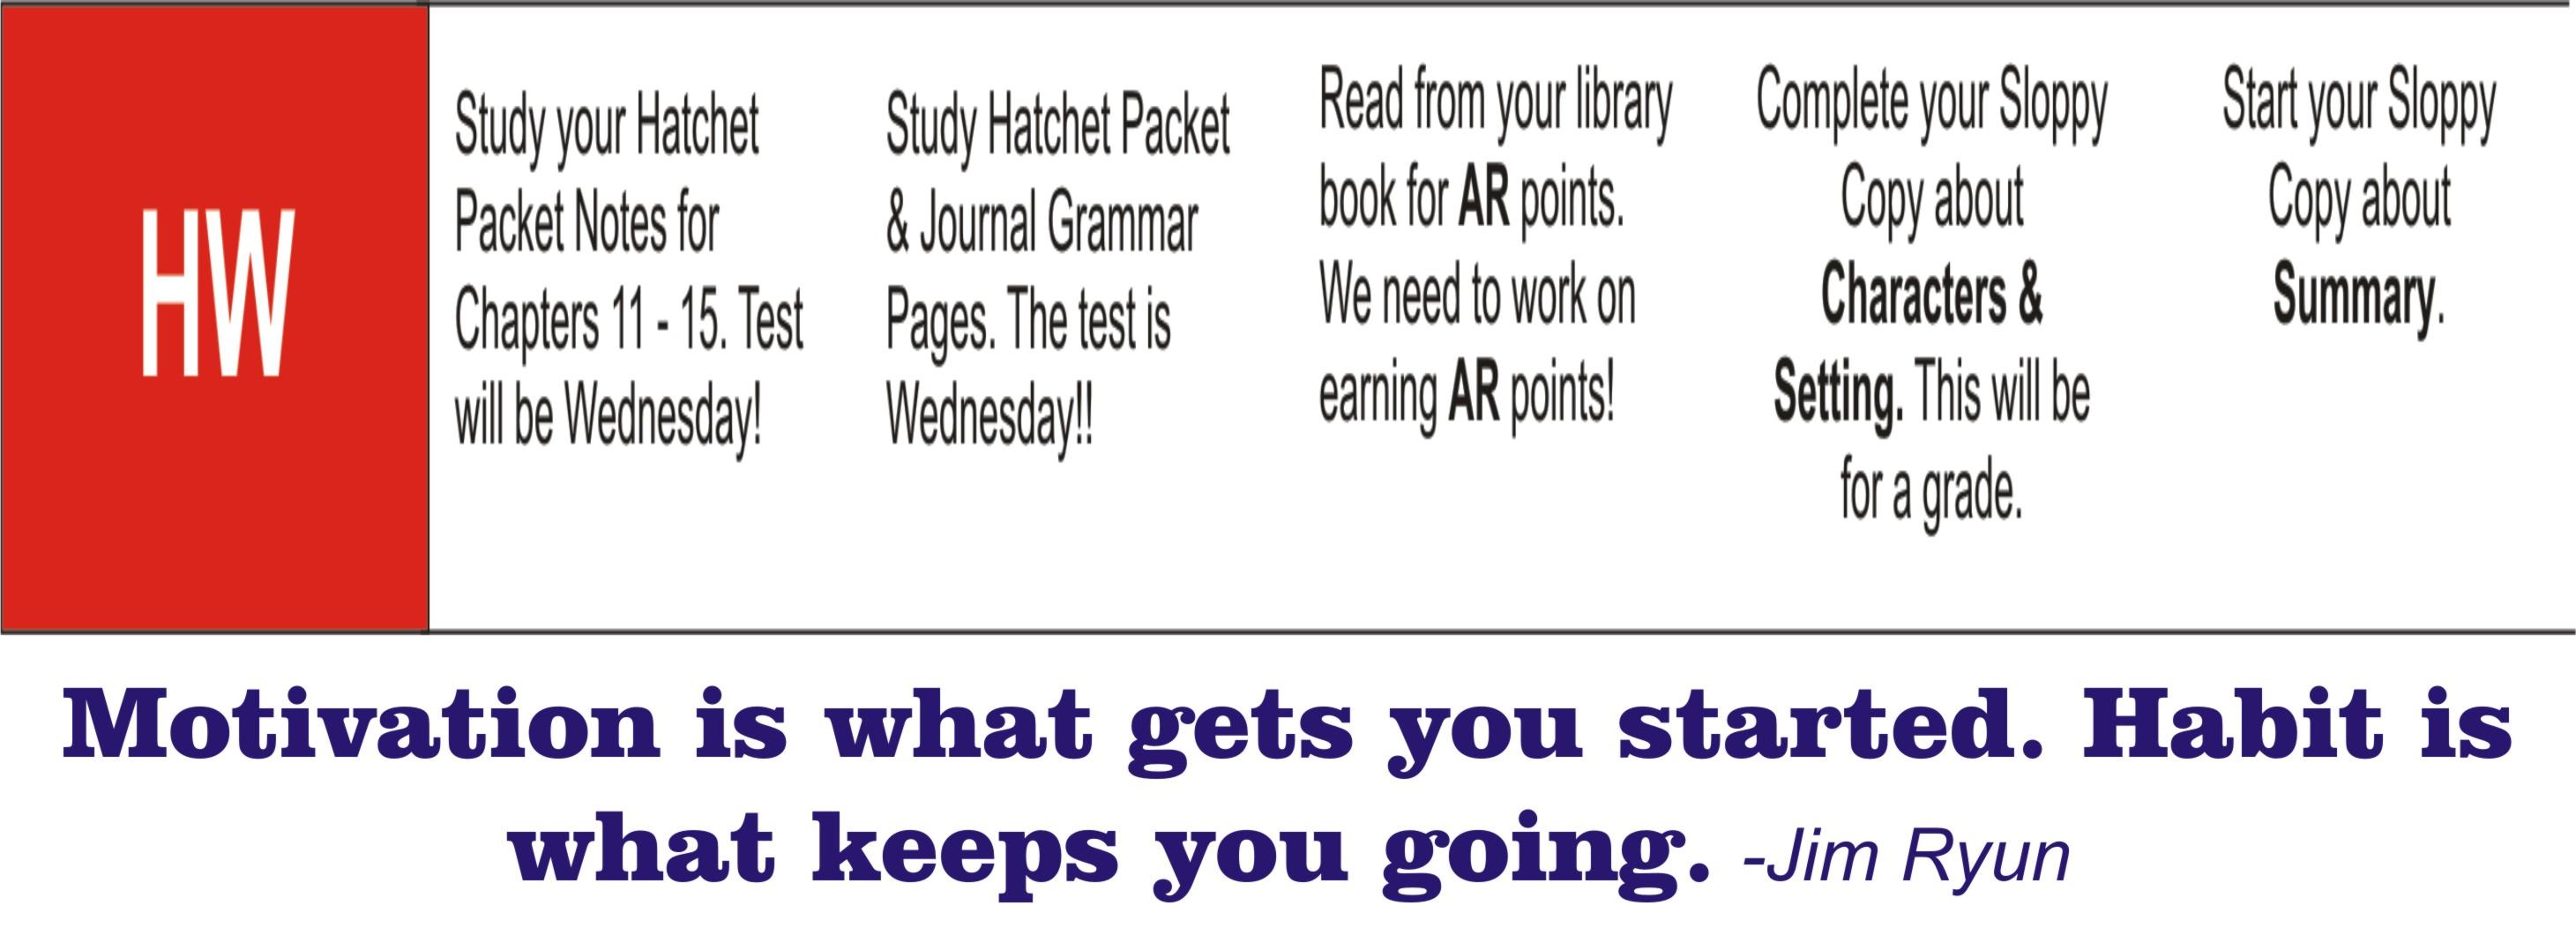 homework week 11 Homework week eleven ending june 28 2013 1 reading – 15 mins per night 2 digital portfolios – complete the evaluations for your three selected slides.